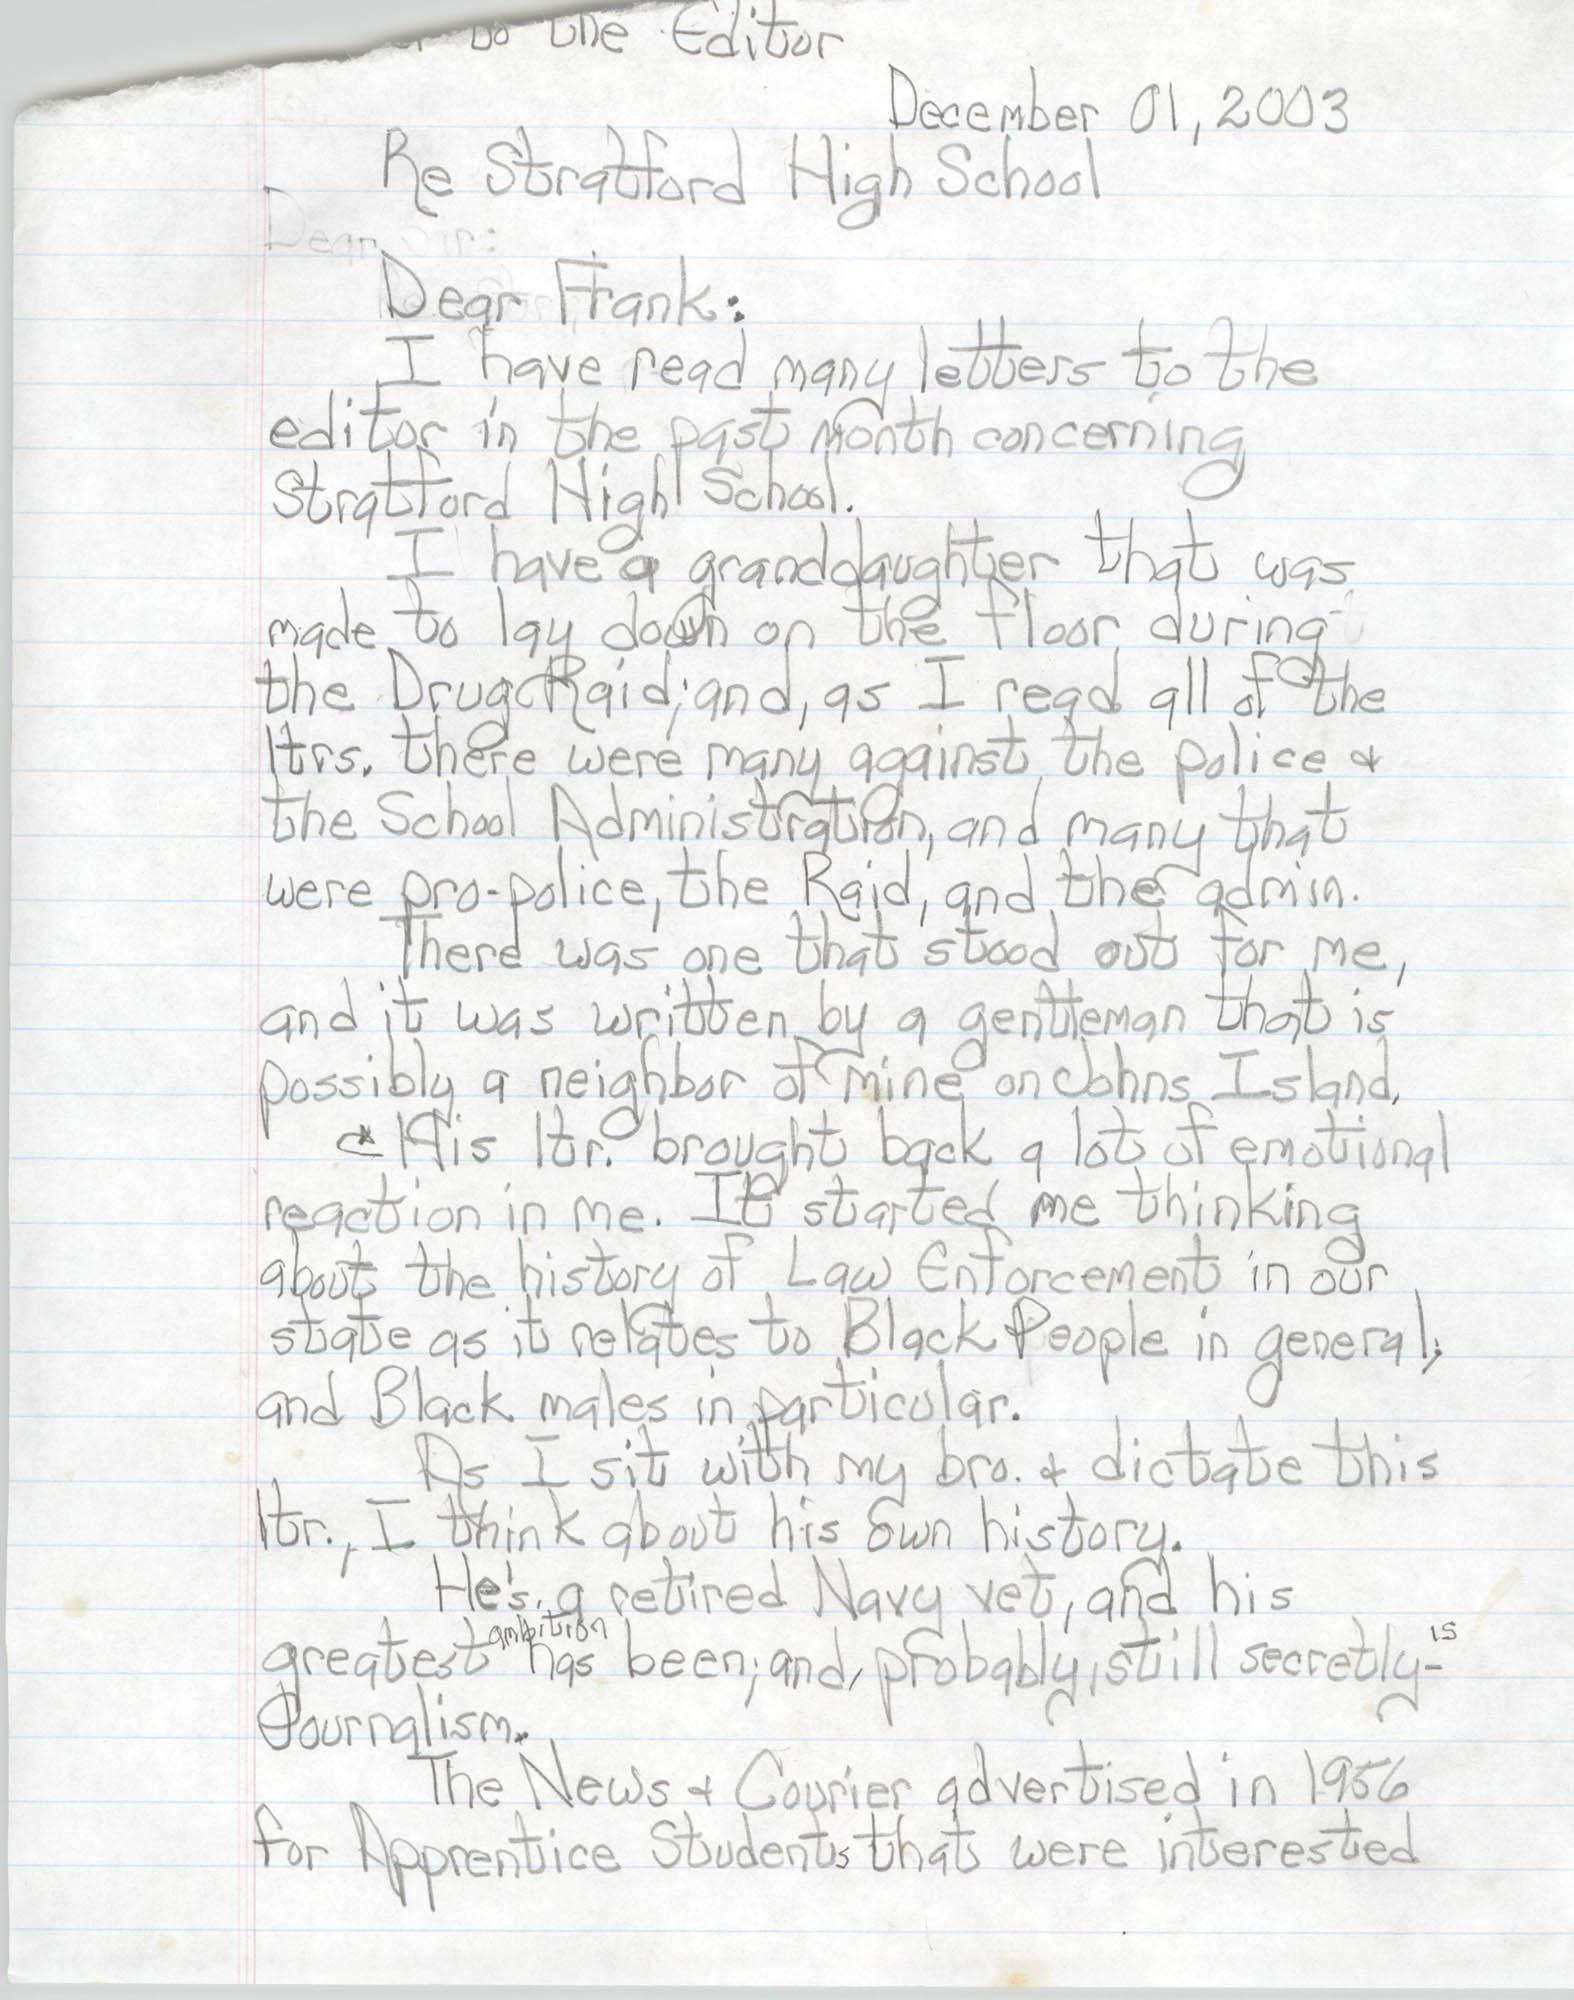 Letter to the Editor Regarding Stratford High School